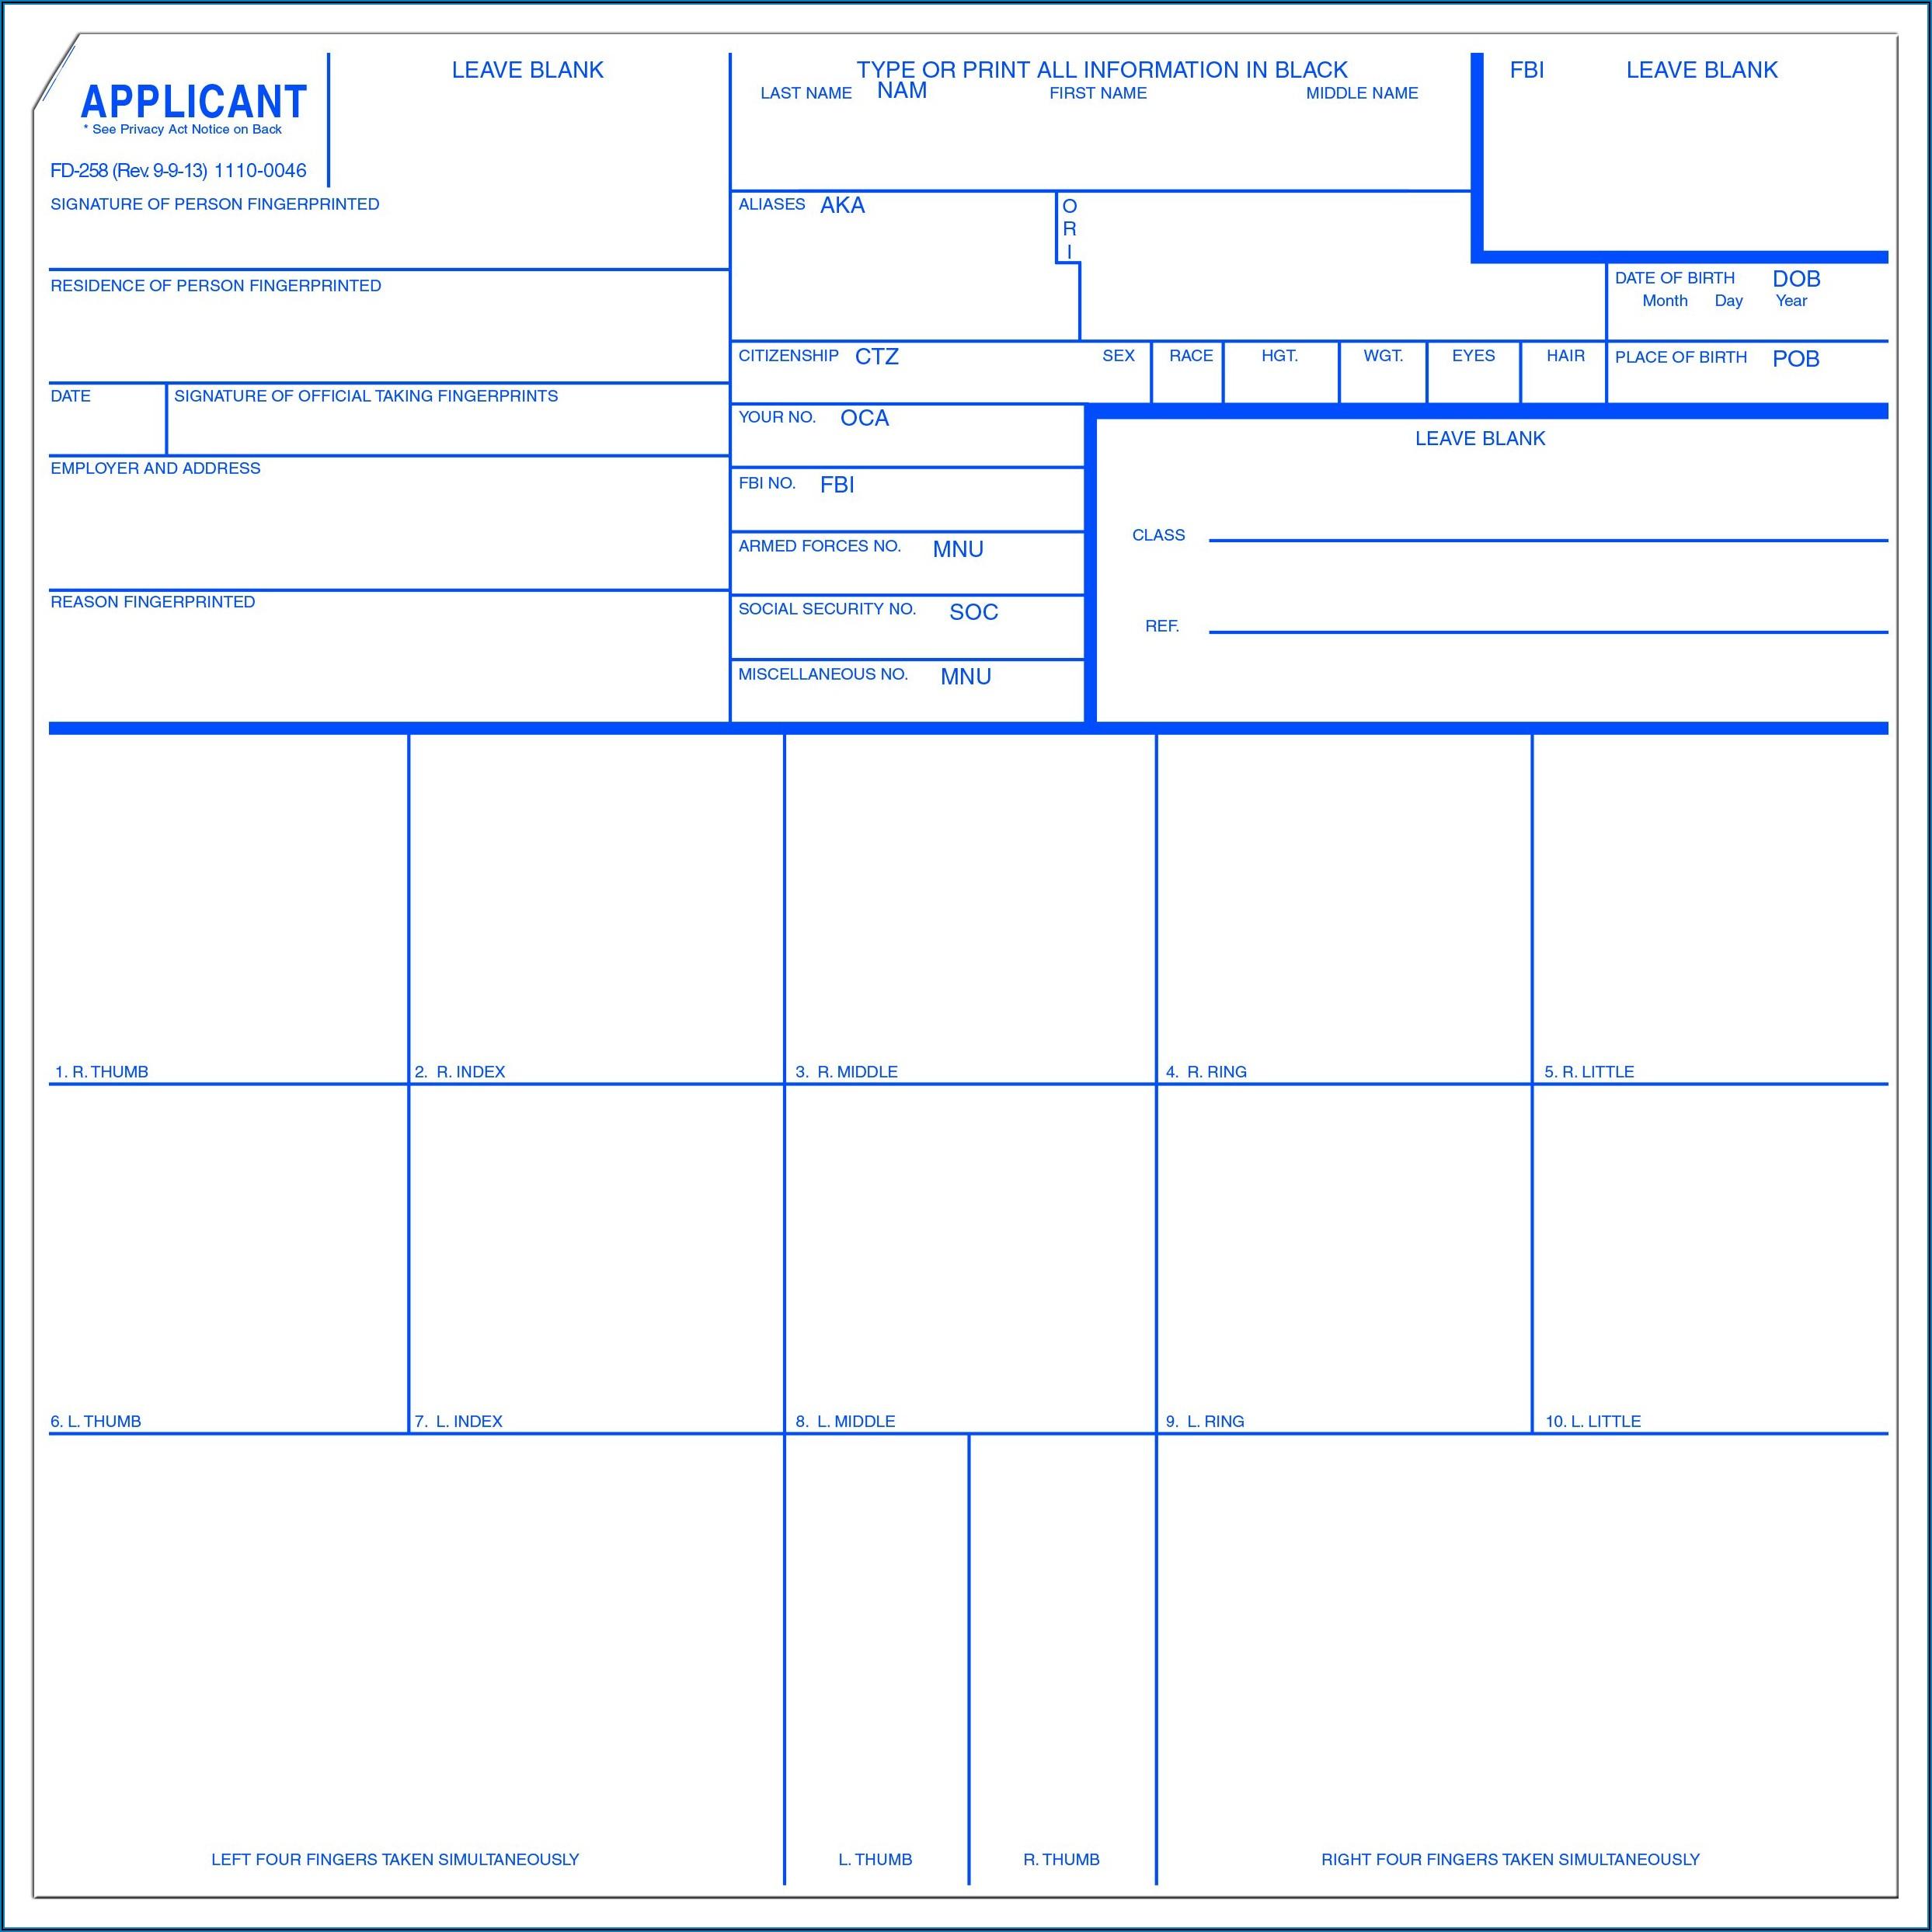 Fingerprint Form Fd 258